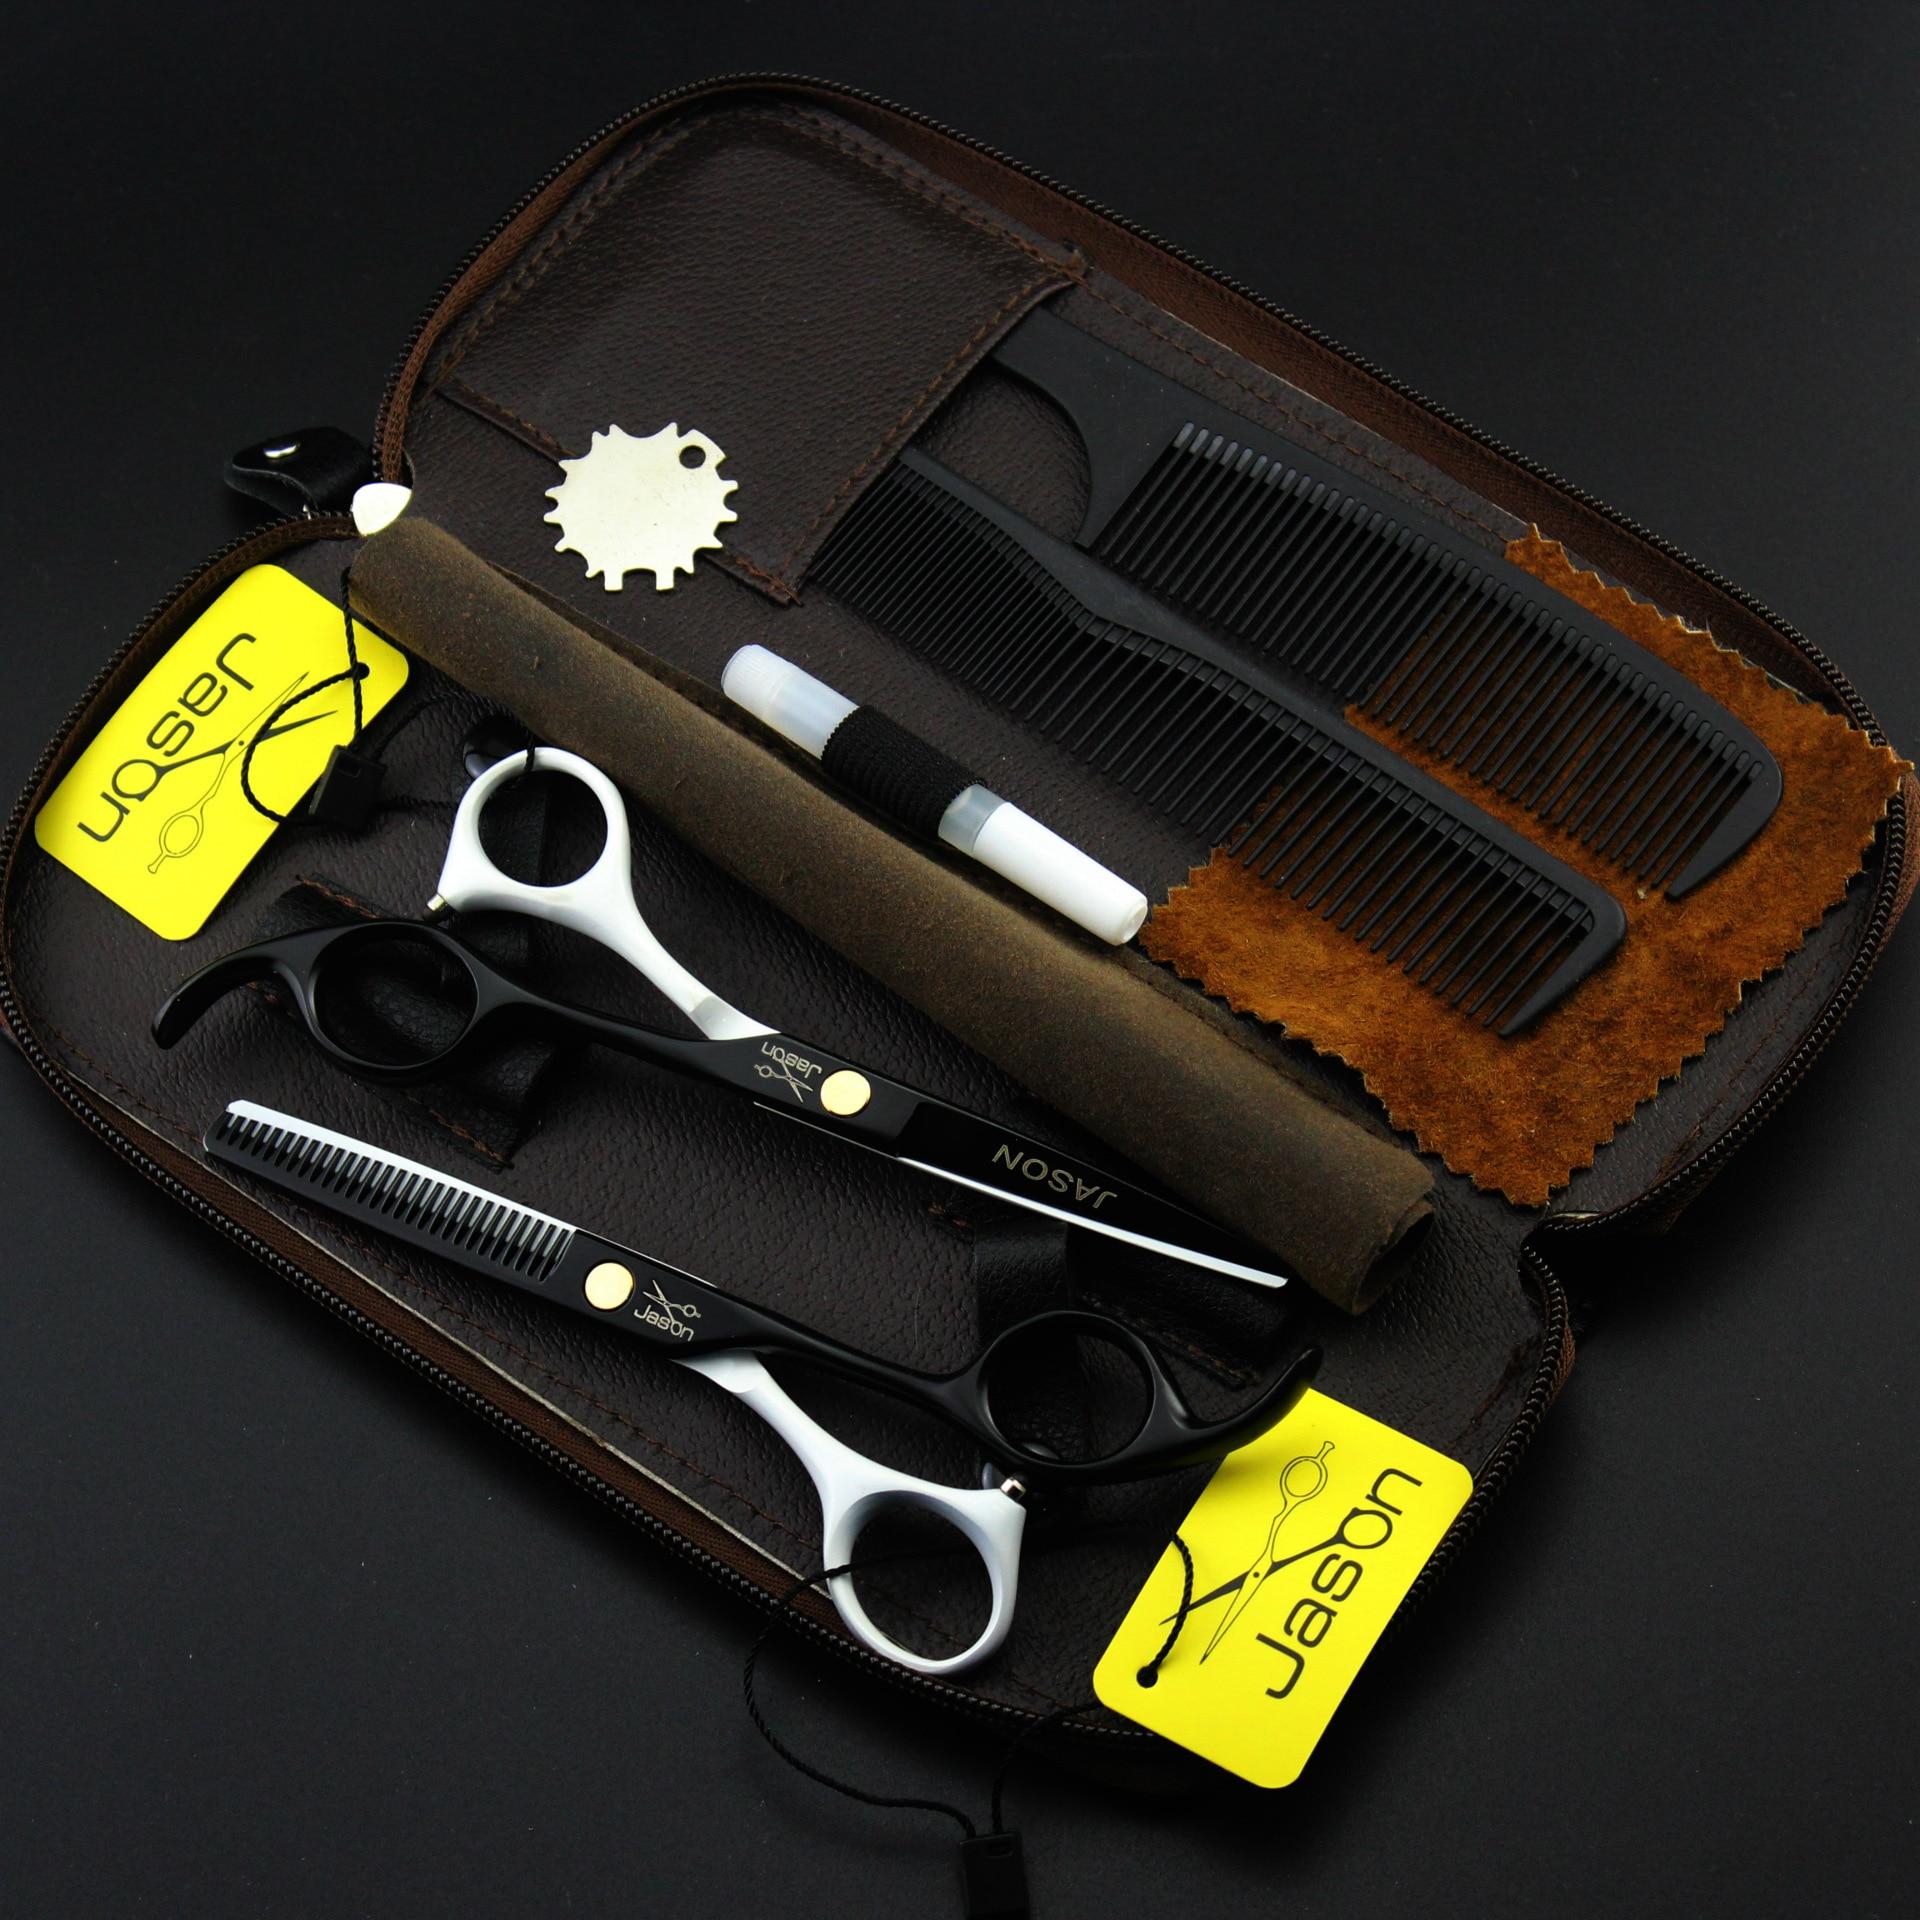 New Professional Hairdressing Scissors 5.5inch Barber Scissors High Quality Salon Set Hair Cutting Shears Scissor Haircut